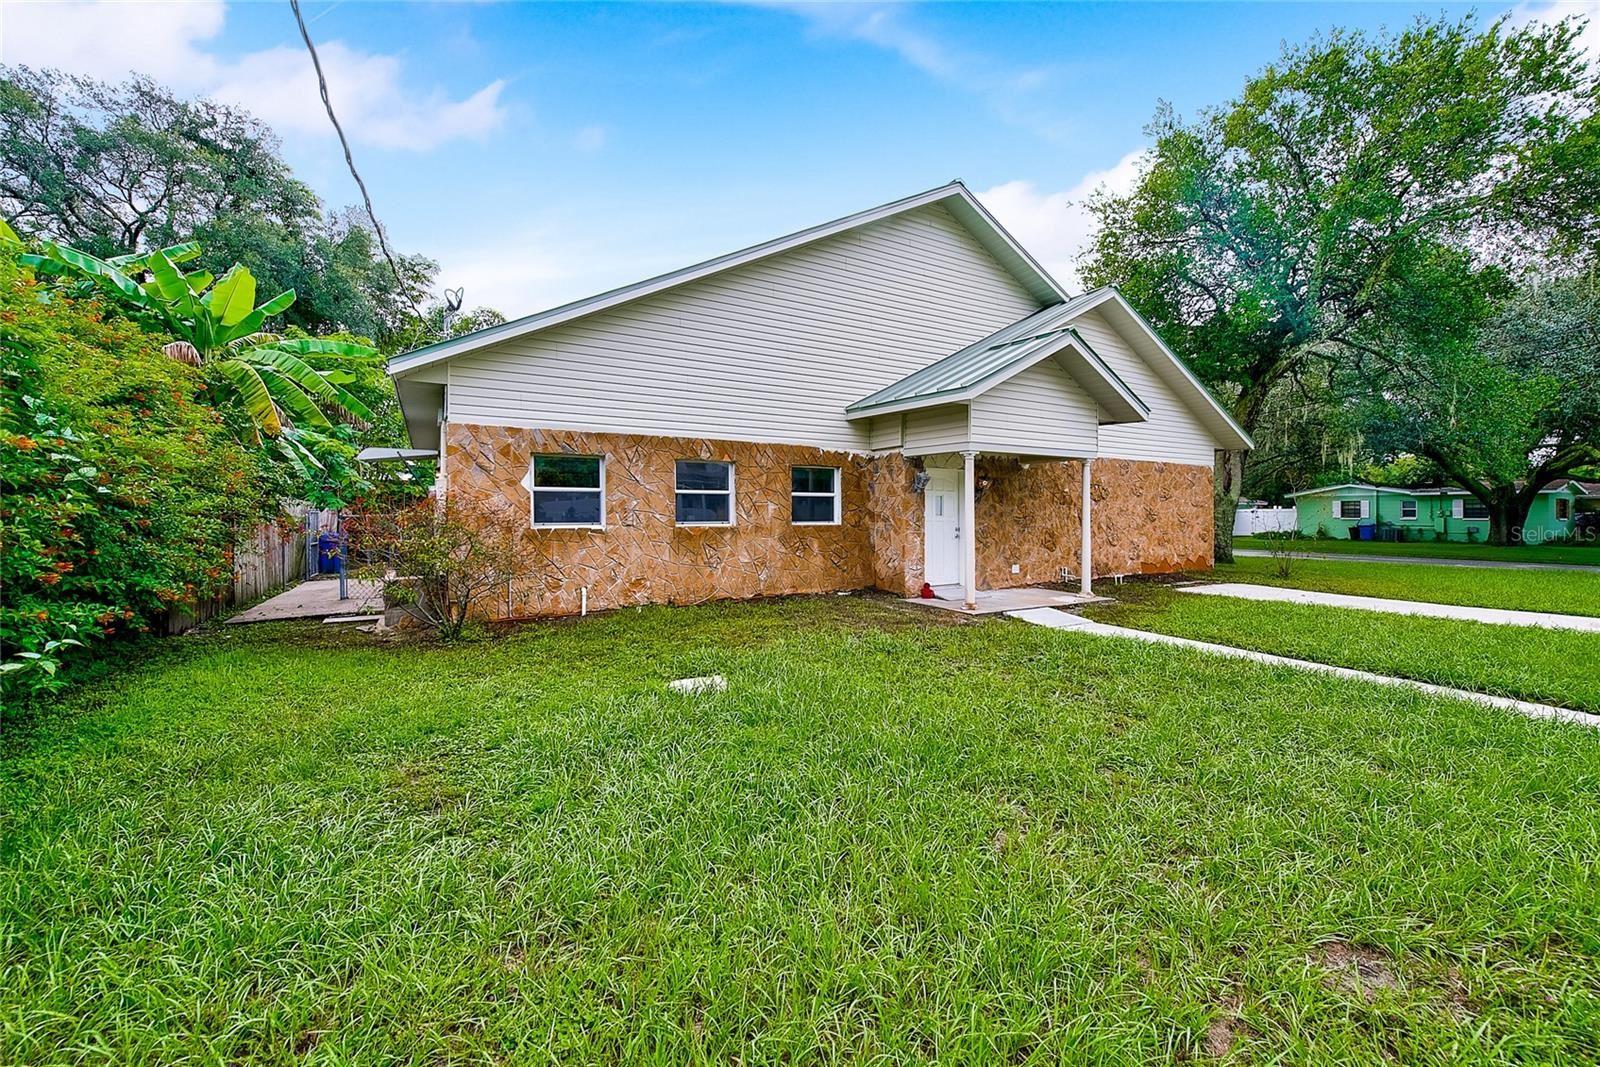 12401 N OAKLEAF AVENUE, Tampa, FL 33612 - #: T3328838